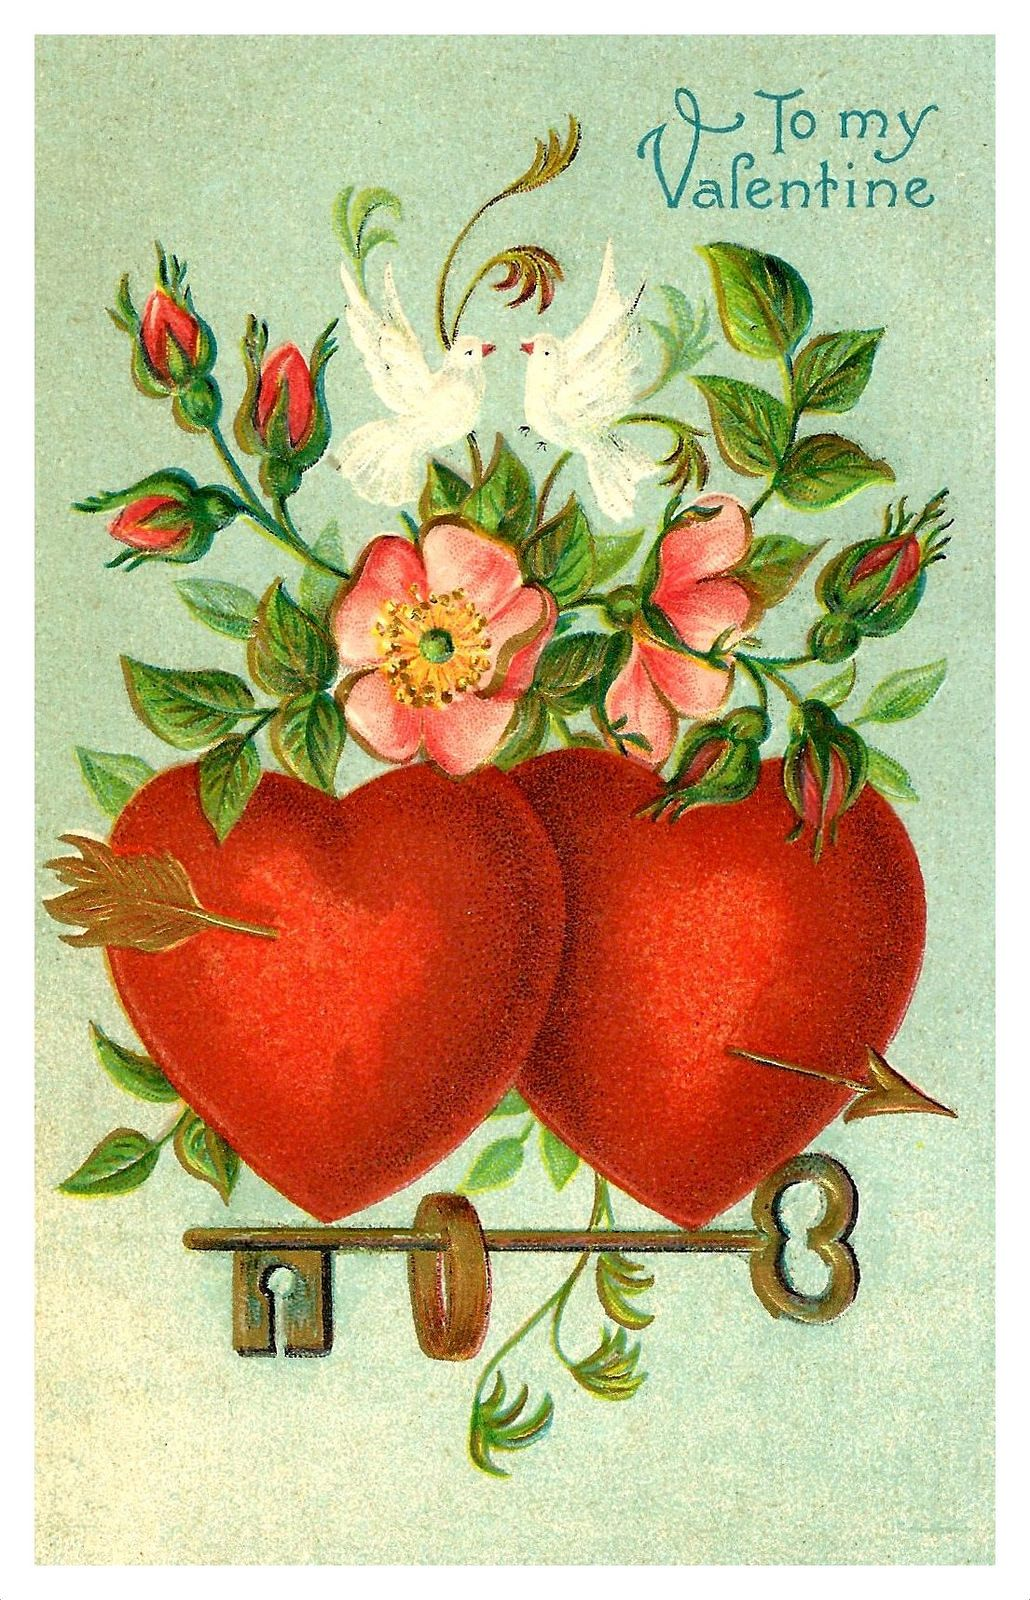 vintage valentine postcard to my valentine made in germany a s b vintage valentine card. Black Bedroom Furniture Sets. Home Design Ideas